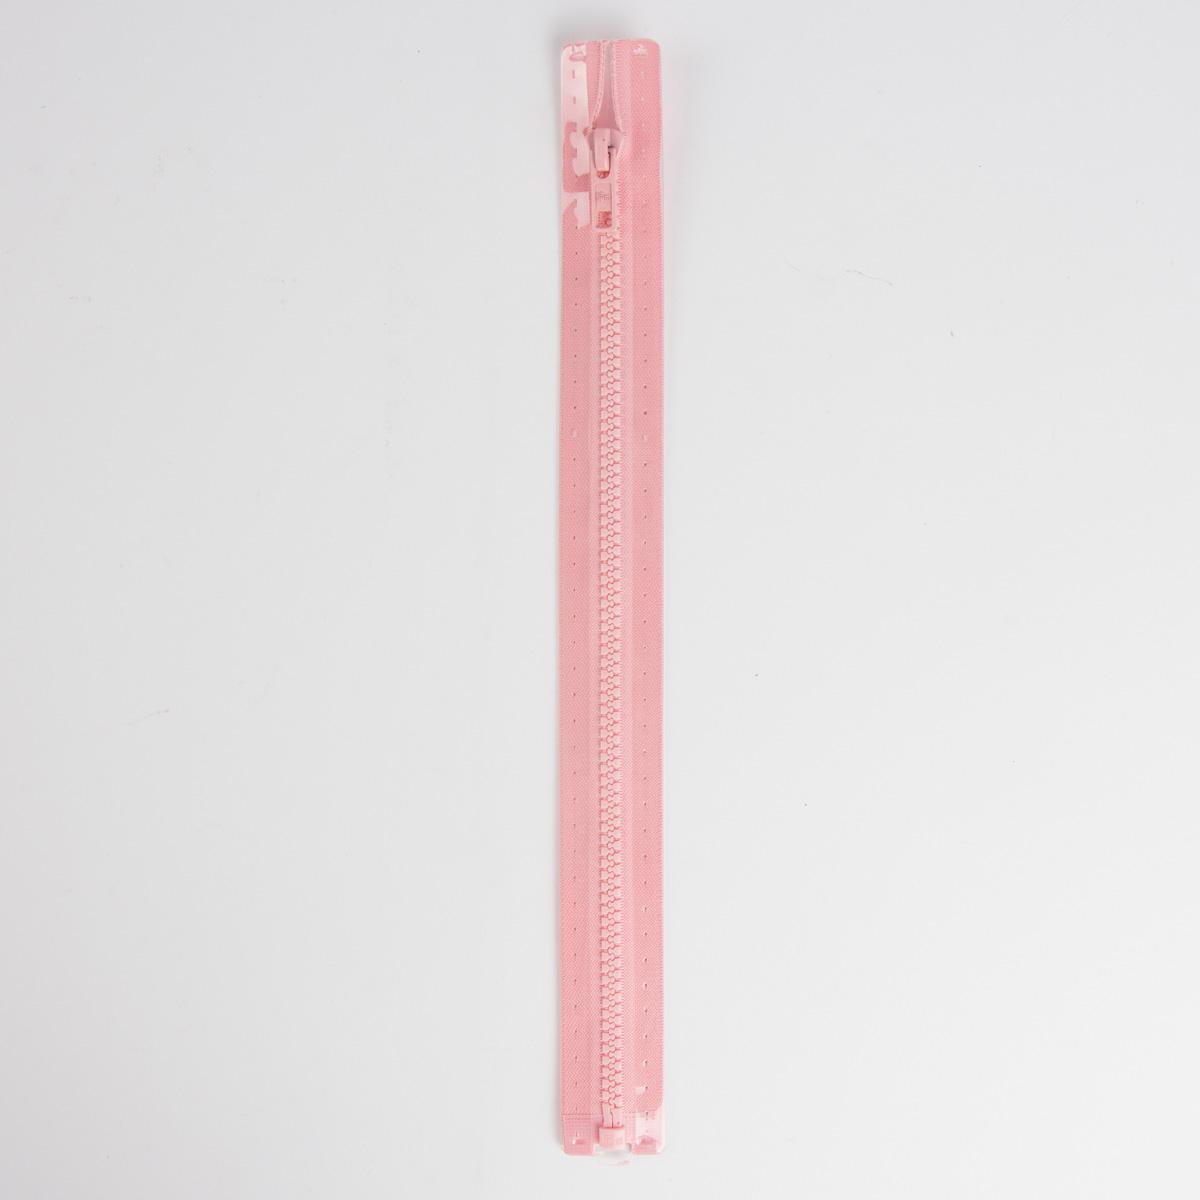 Reißverschluss S4 Profil tb 80 cm Fla rosa